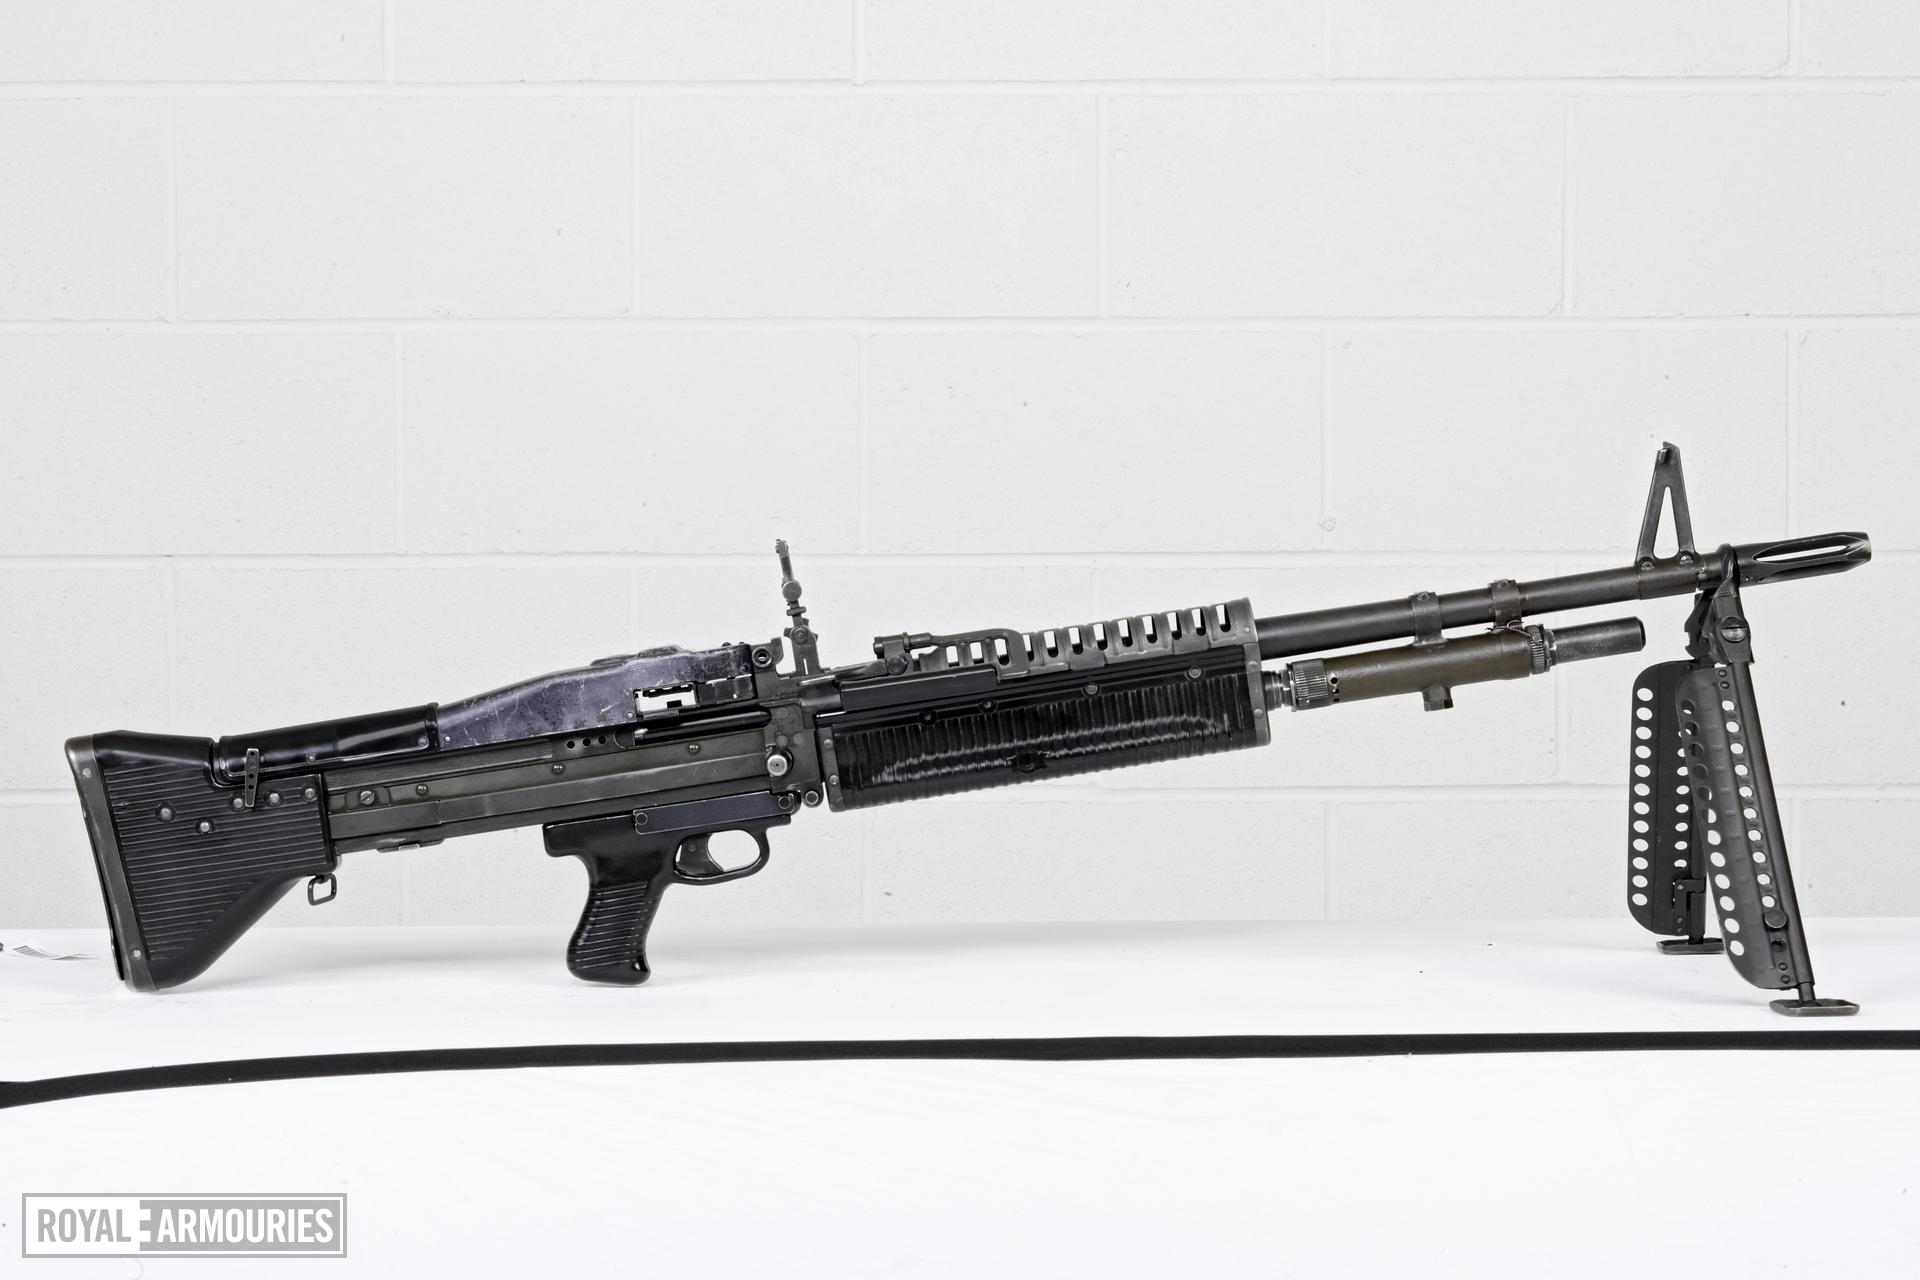 Centrefire automatic machine gun - M60